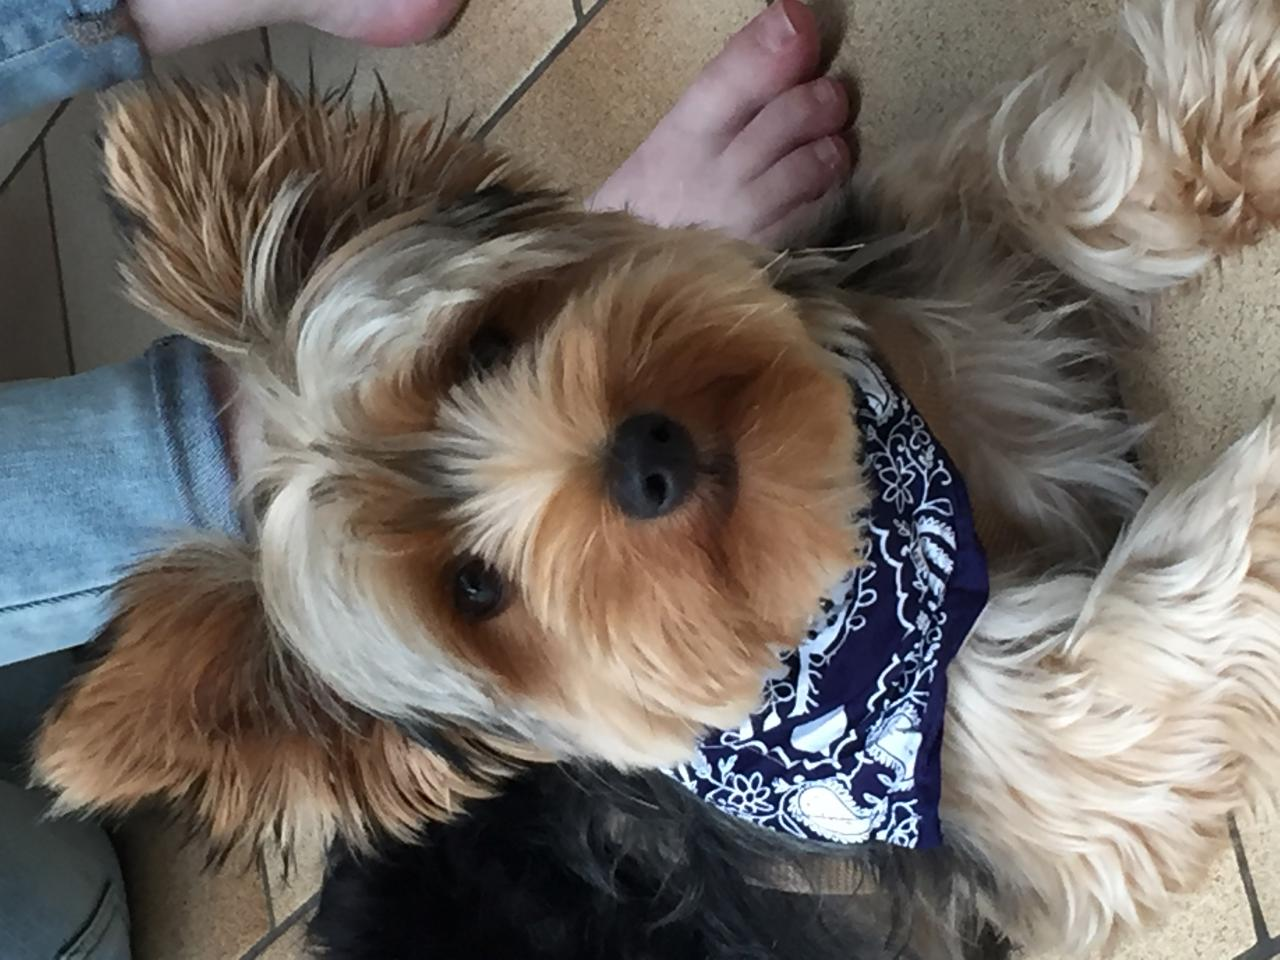 Le petit York de Myriam avec son joli bandana